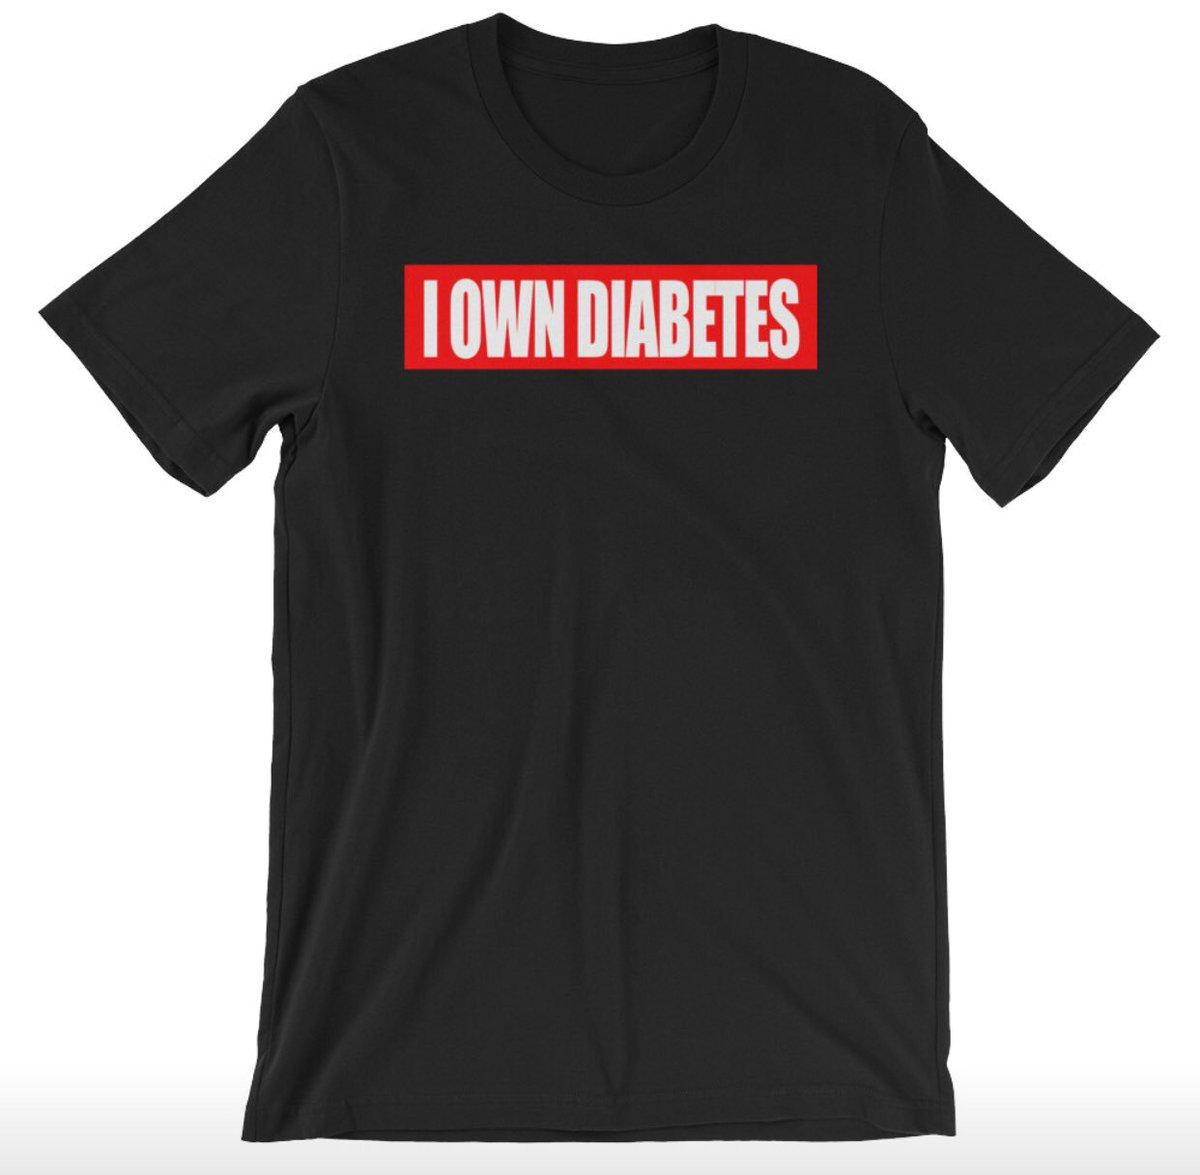 test Twitter Media - I Own Diabetes Unisex tShirt now Available  https://t.co/yGwLkvIkdE  #diabetic #diabadass #diabeticfood #diabeticfitness #dexcom #dexcomg5 #jdrf #jdrfonewalk #insulin #insulina #t1d #type1diabetes #type1 #type1warrior #diabetes #diabetic #diabadass #diabeticfood #diabeticfitness https://t.co/jIYGae9ip6